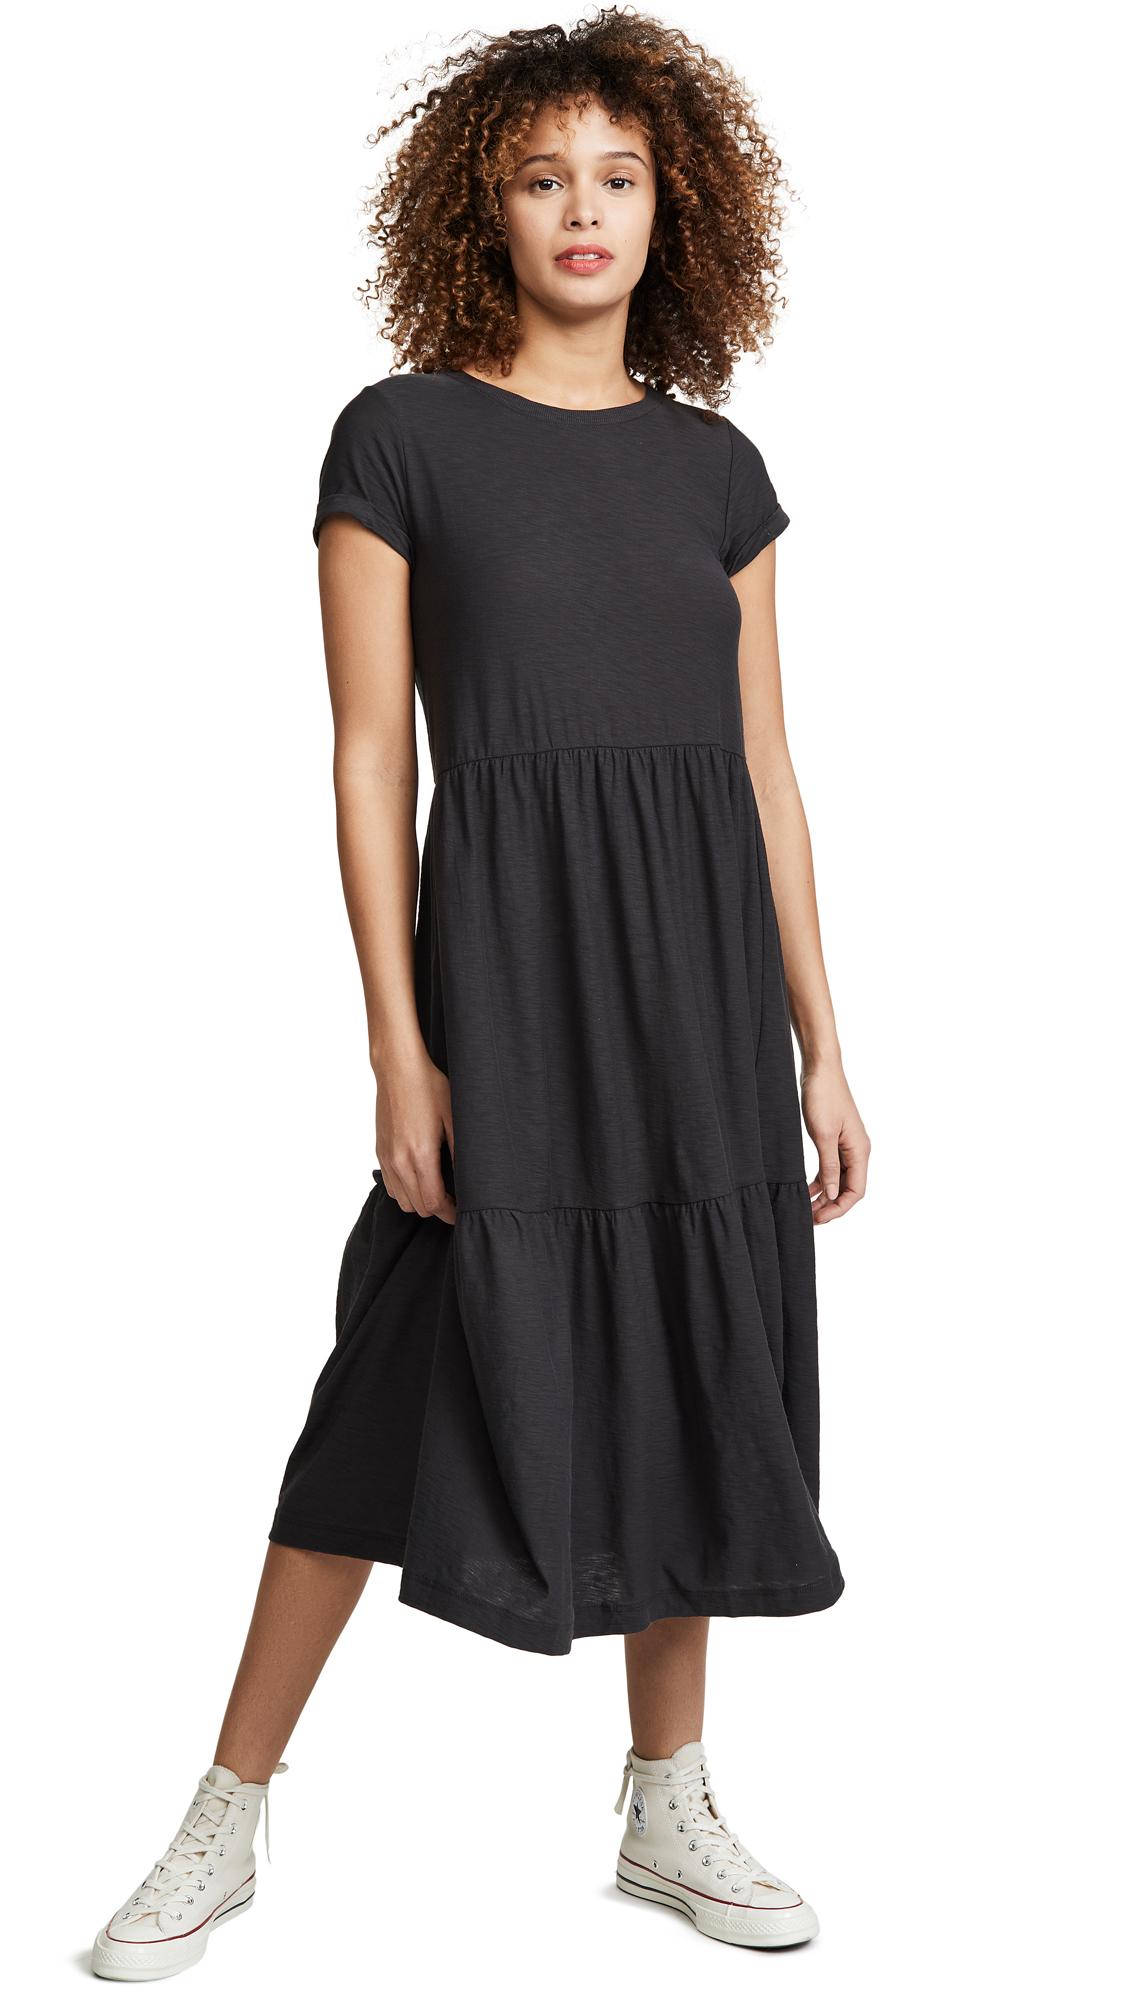 Buy Nation LTD Roman Dress online beautiful Nation LTD Clothing, Dresses